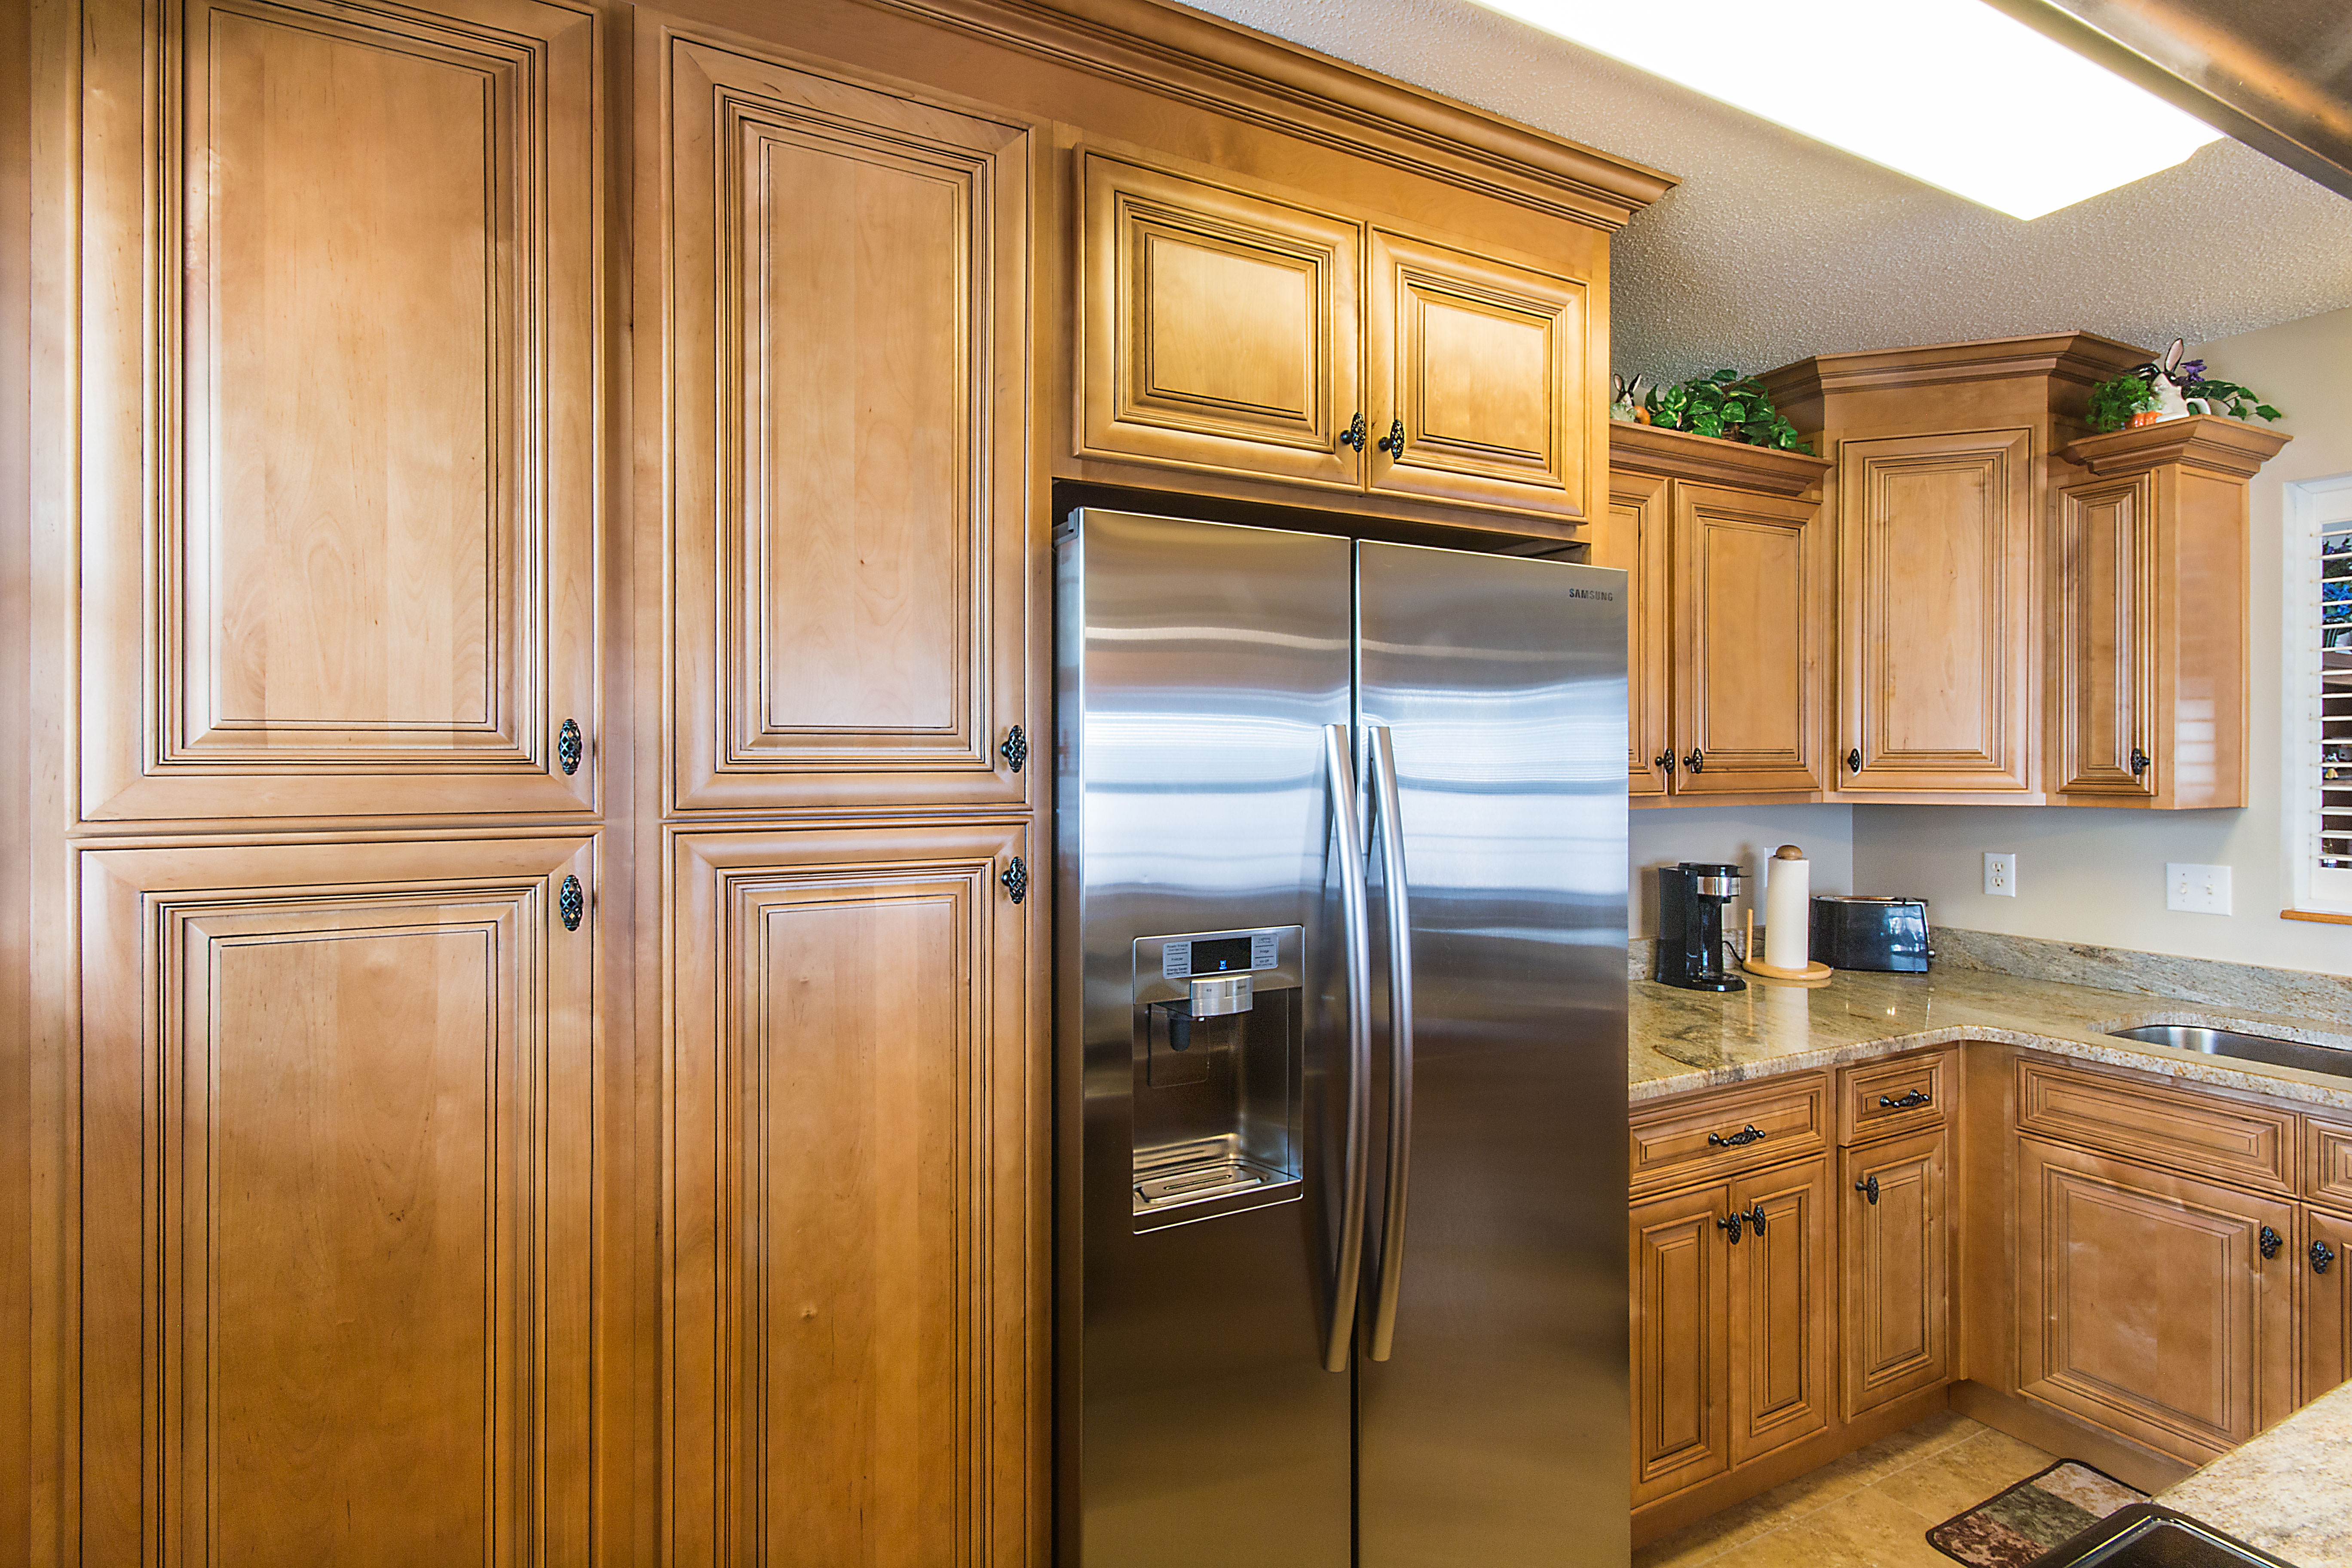 Mocha Pantry Cabinets